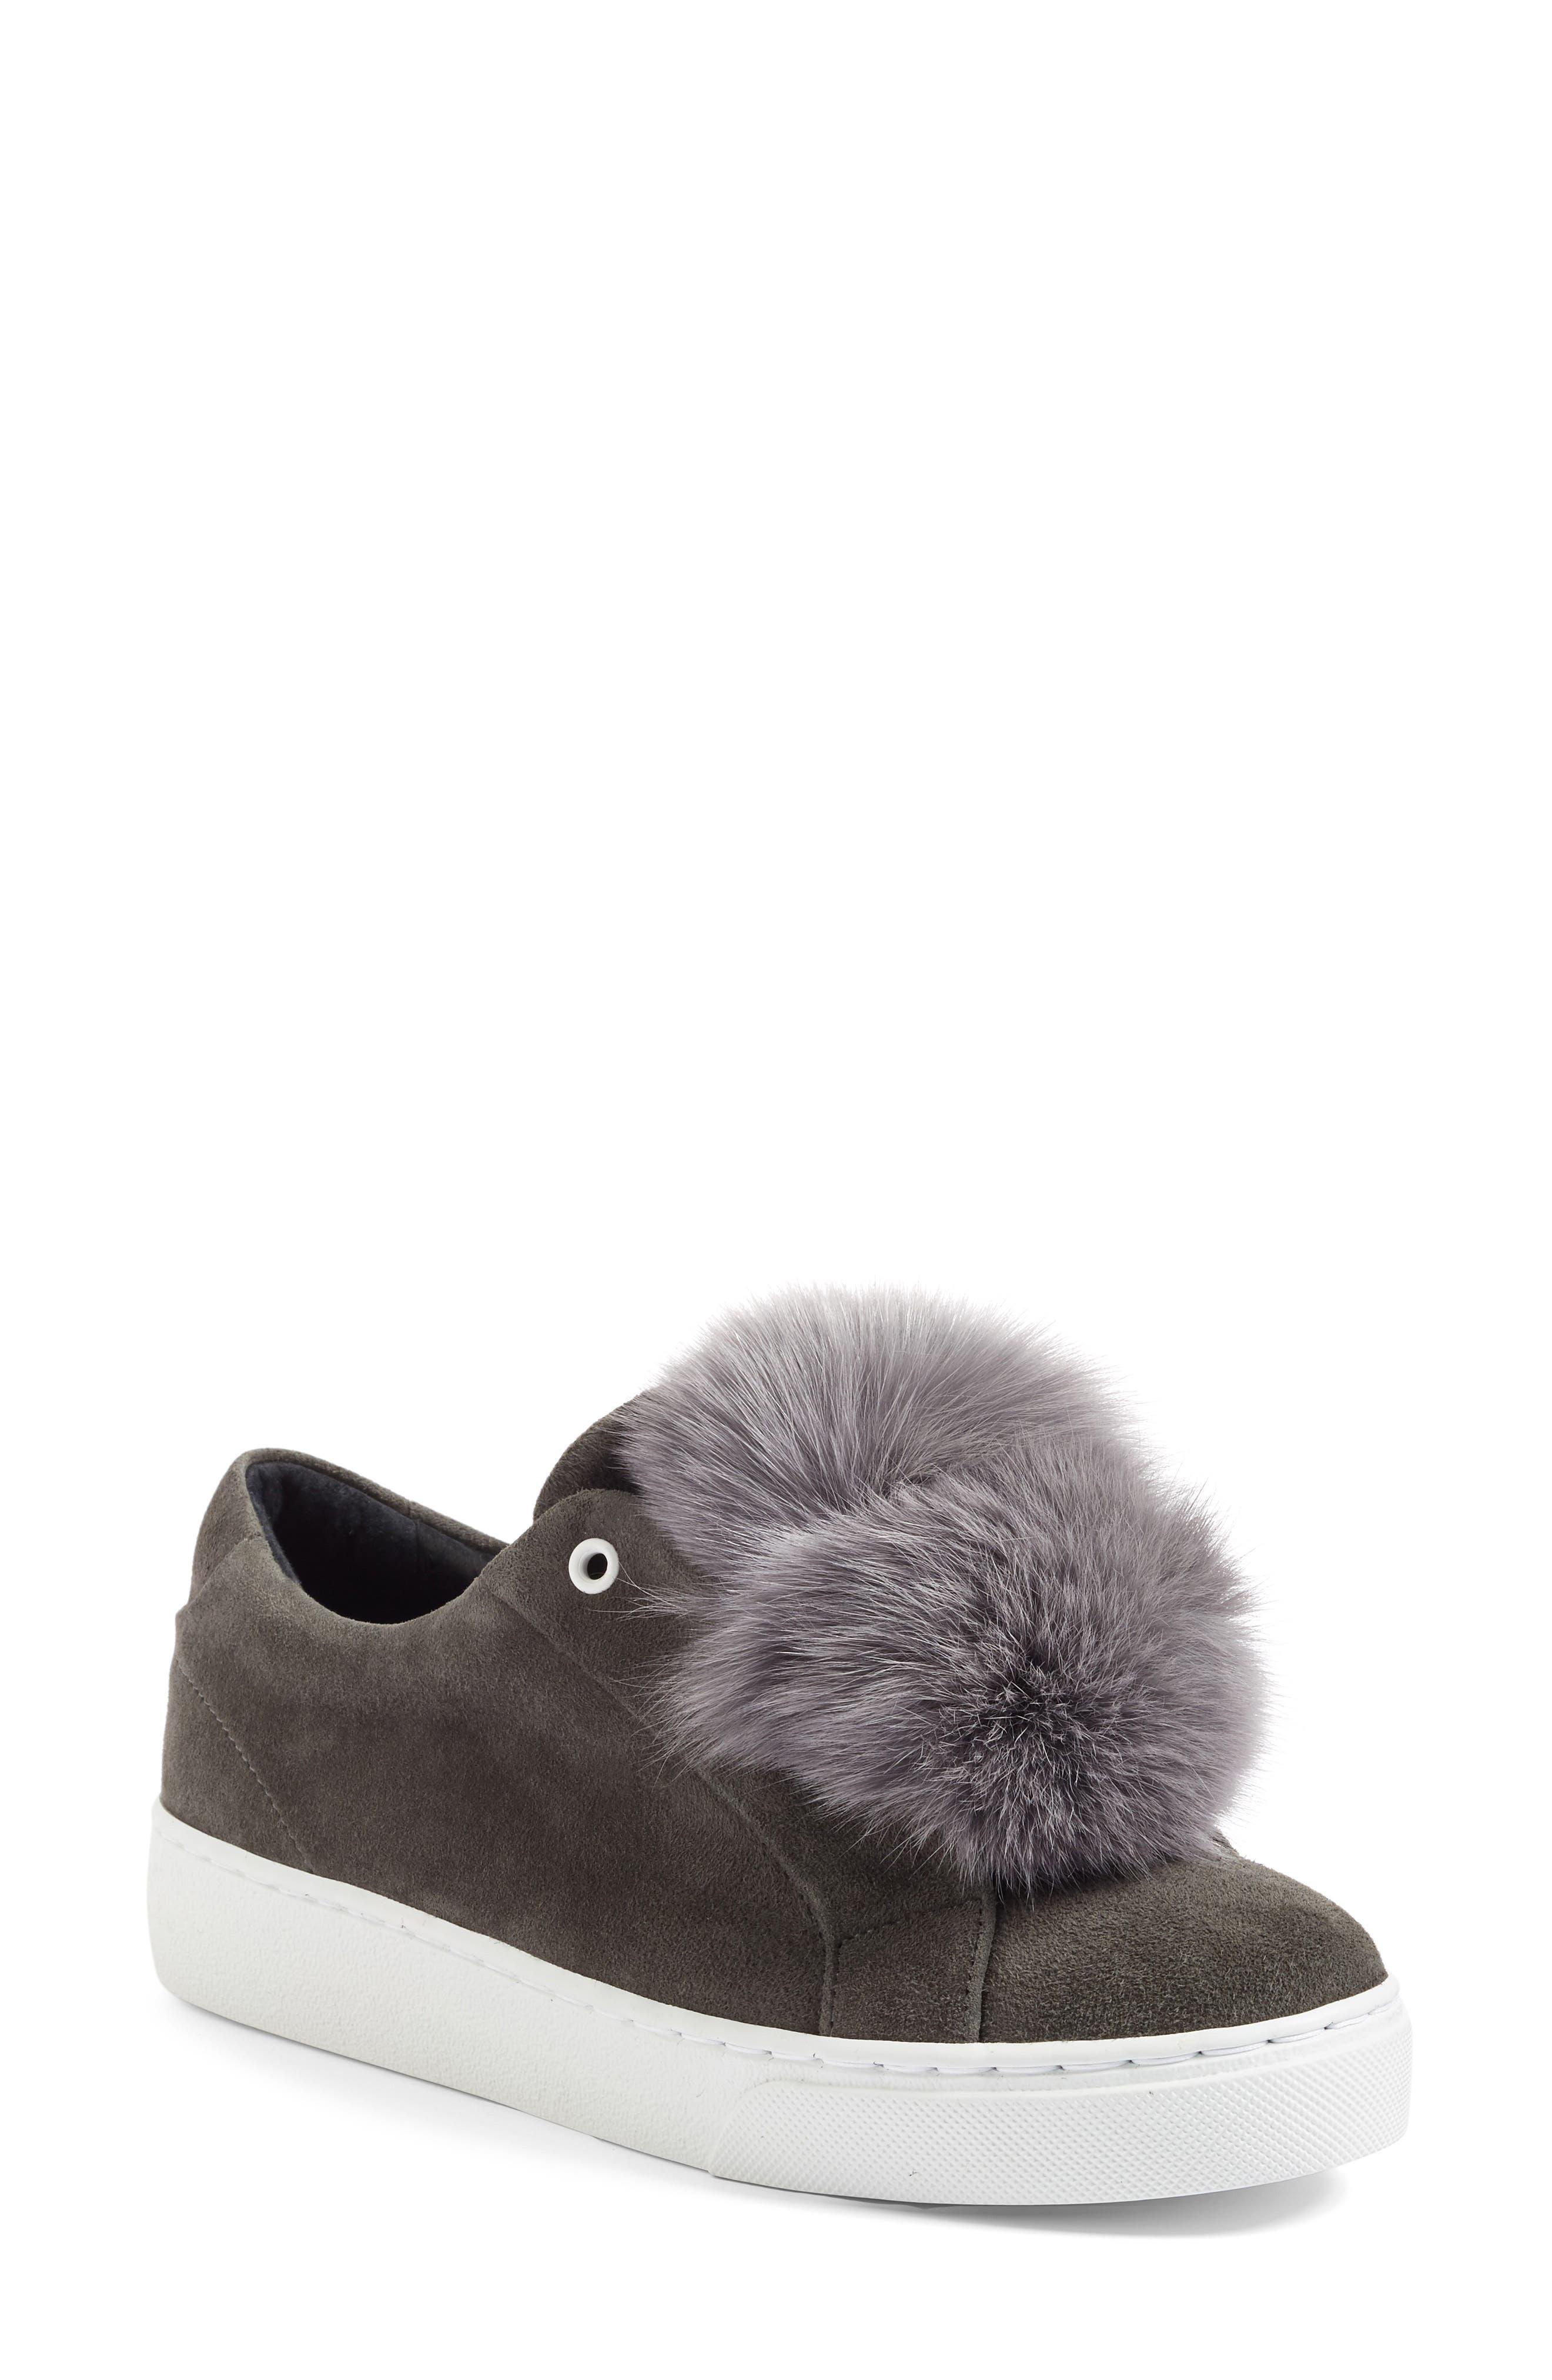 Main Image - Here / Now Heather Genuine Fox Fur Trim Sneaker (Women)